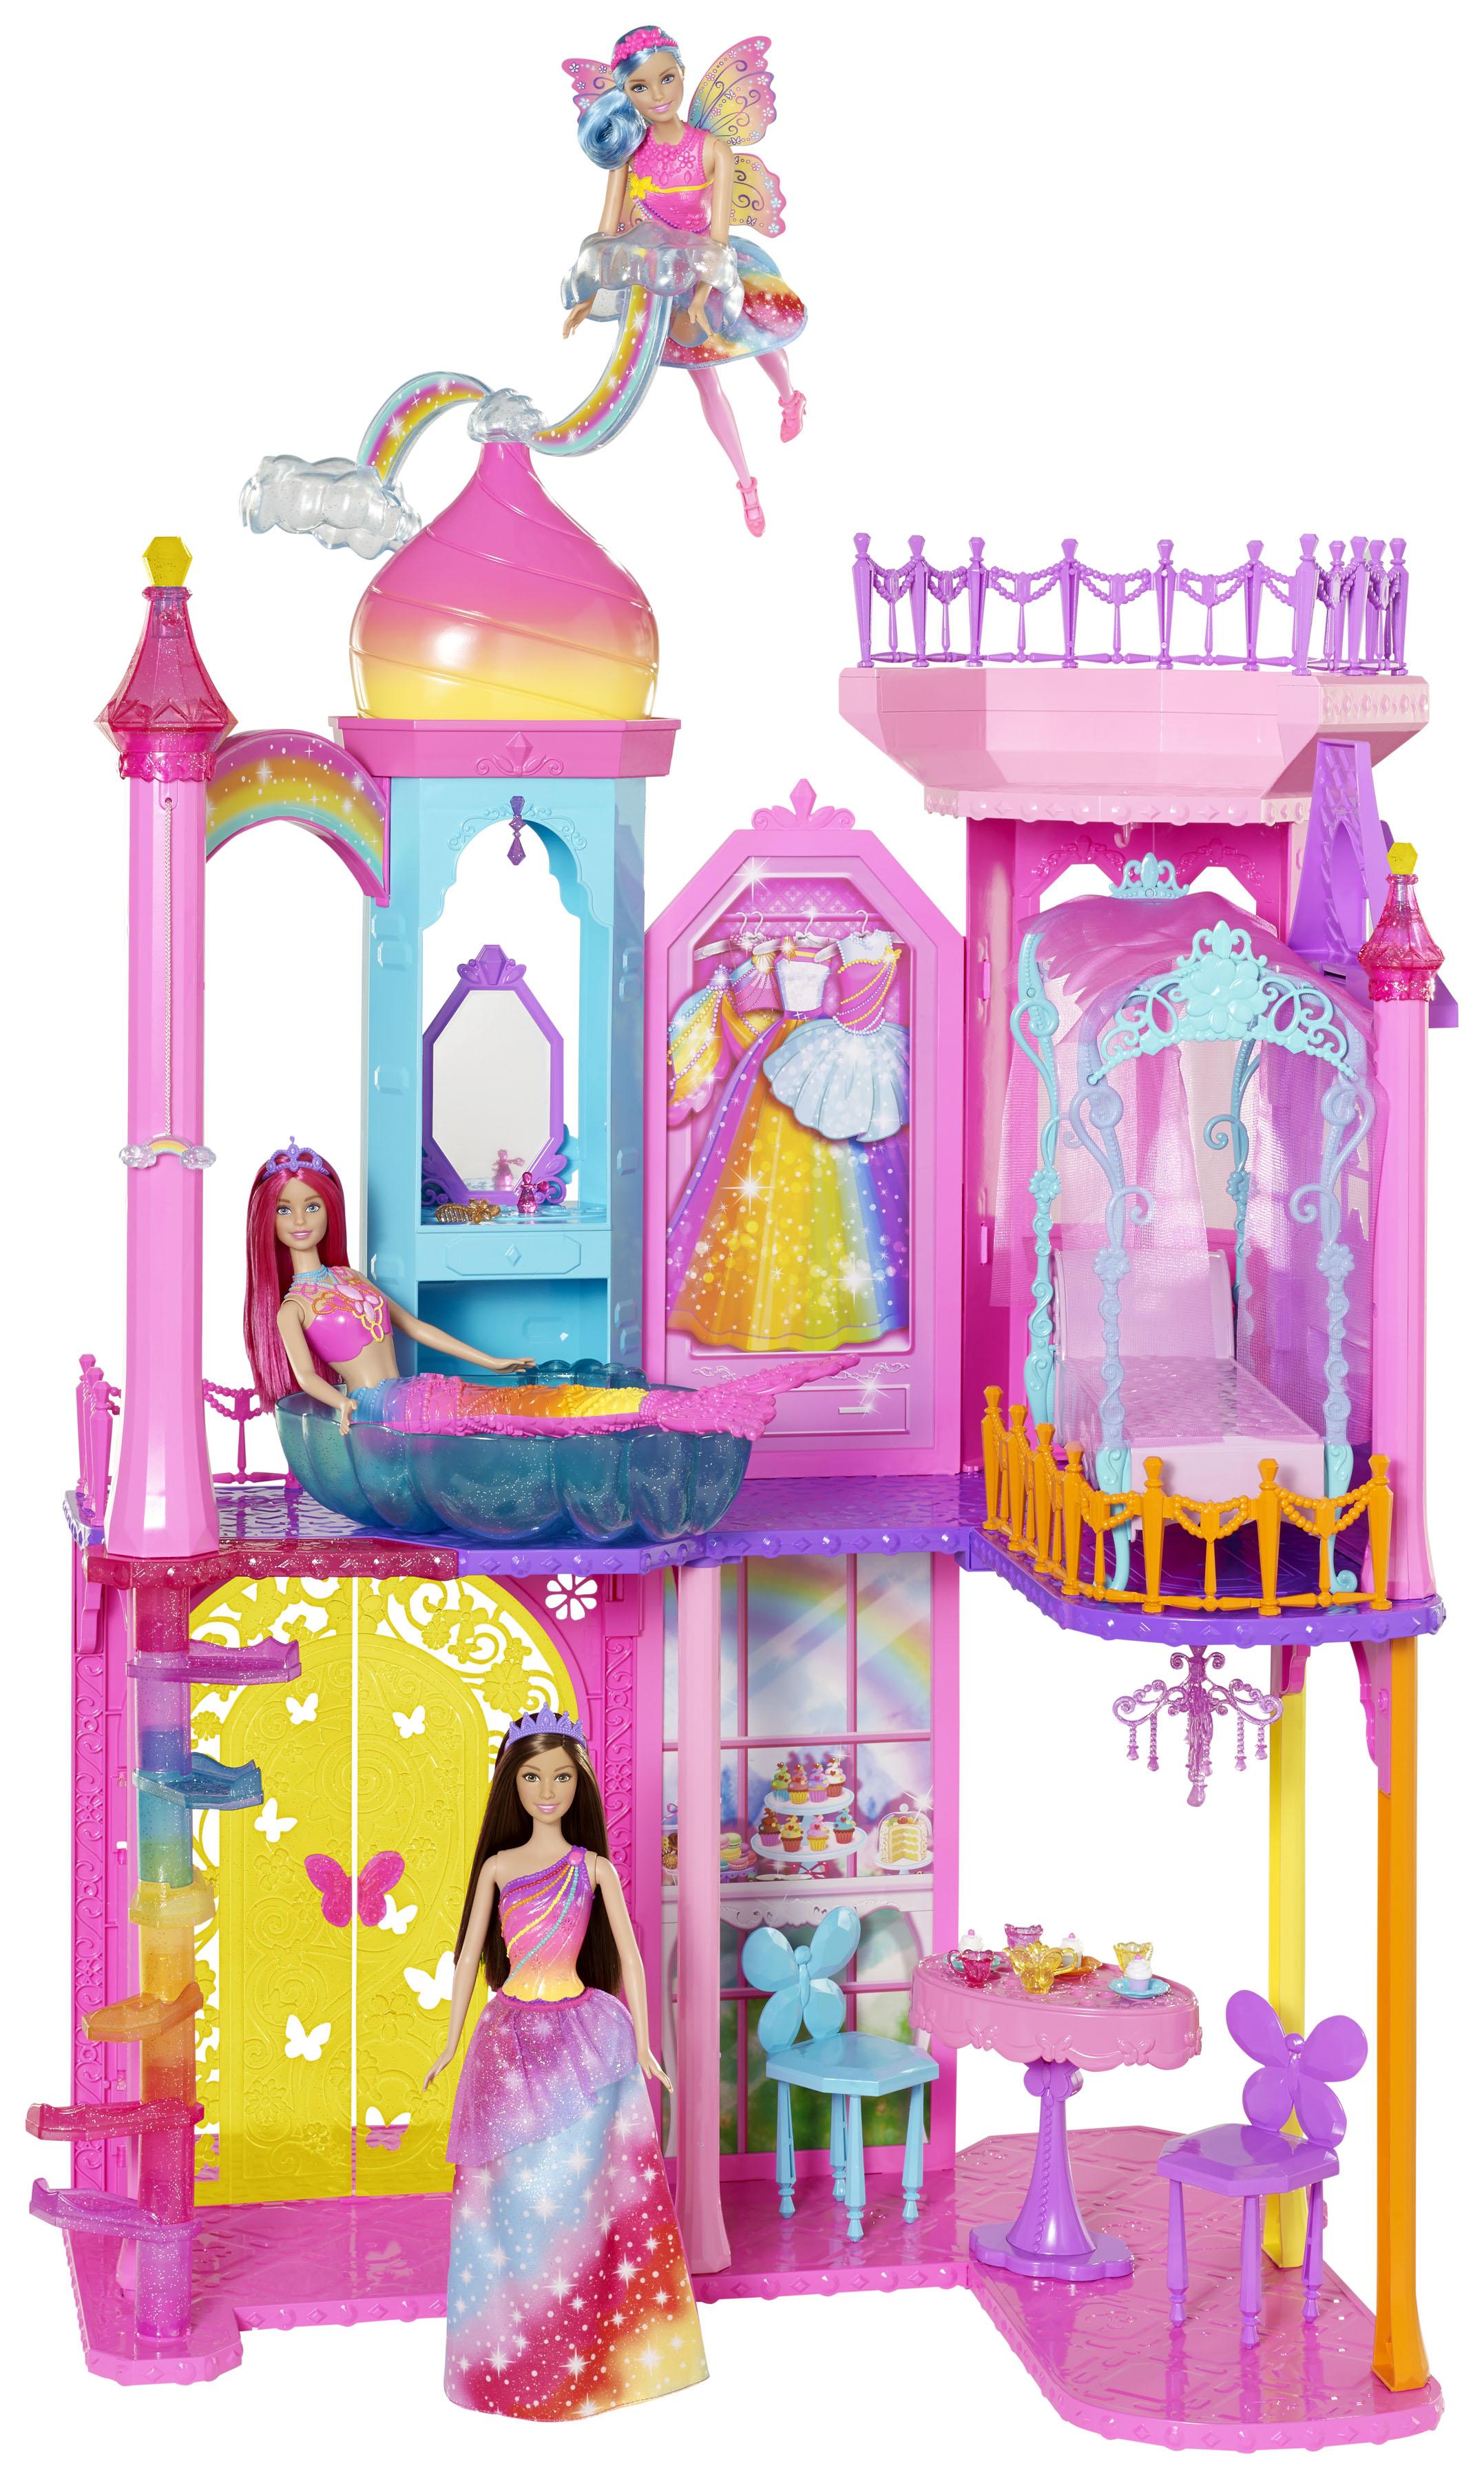 Castillo de la Princesa Barbie Rainbow Cove.